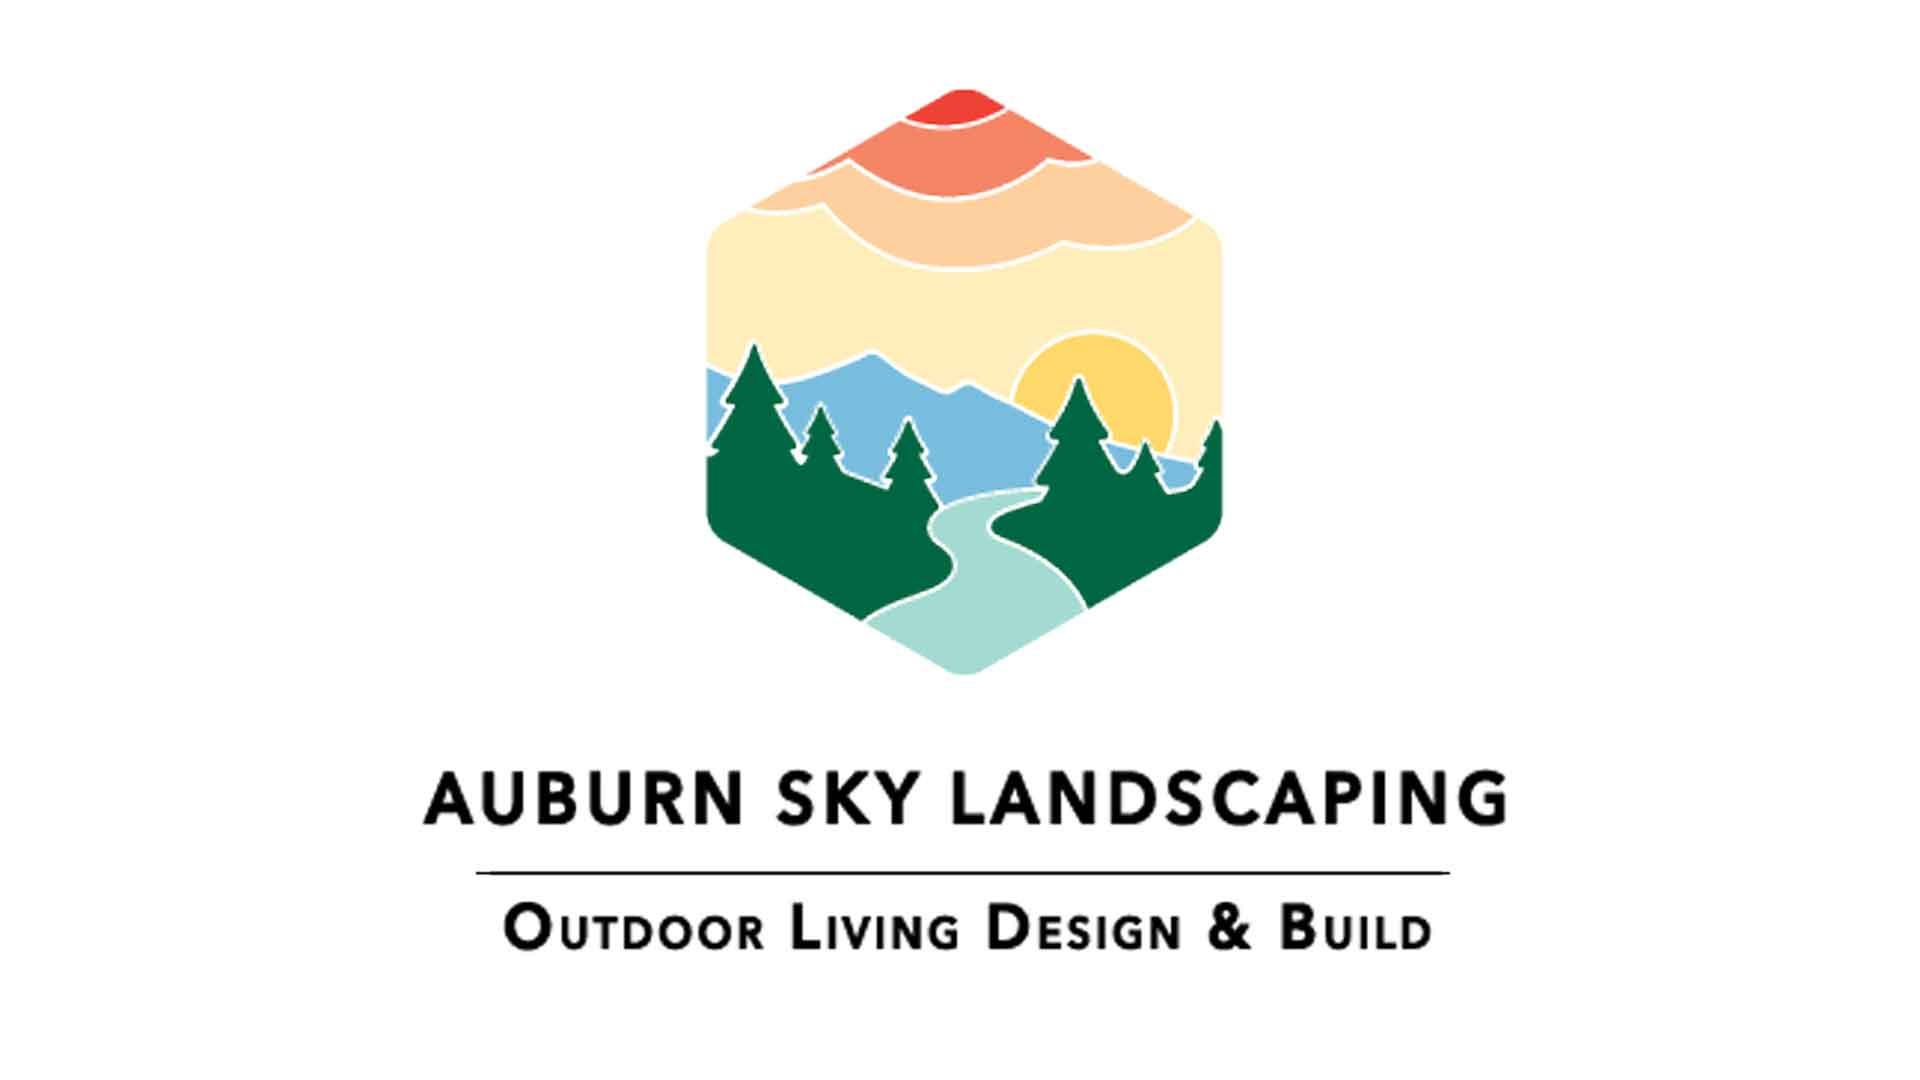 AuburnSkyLandscaping-Logo-1920x1080.jpg